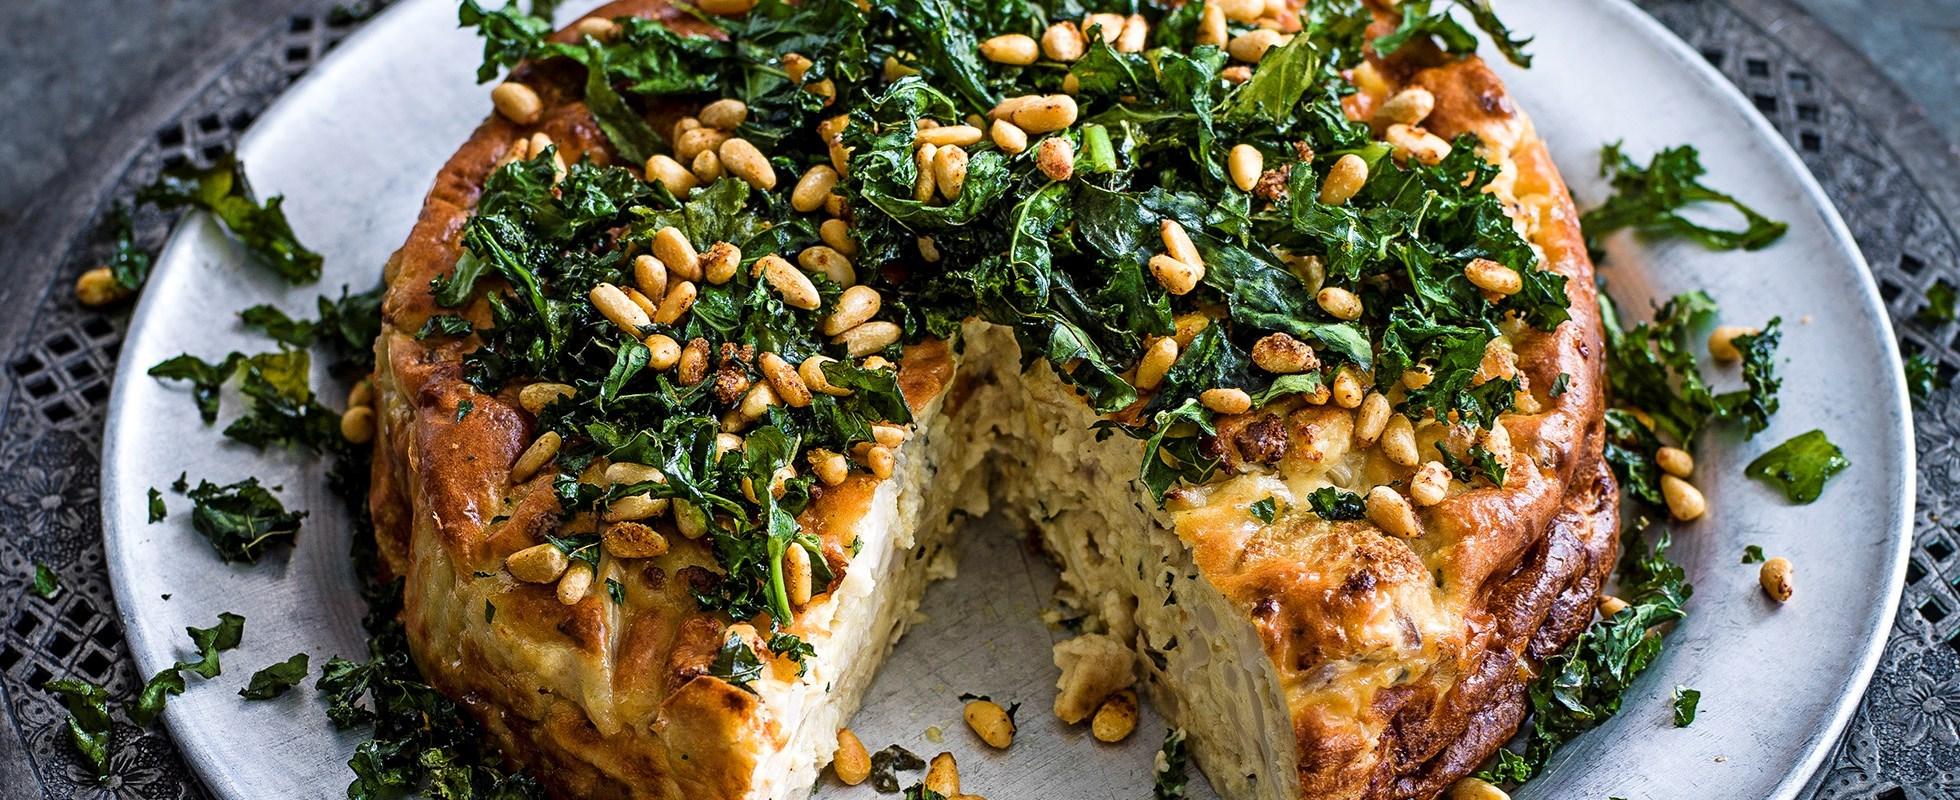 Cauliflower sformato with crispy kale and caramelised pine nuts